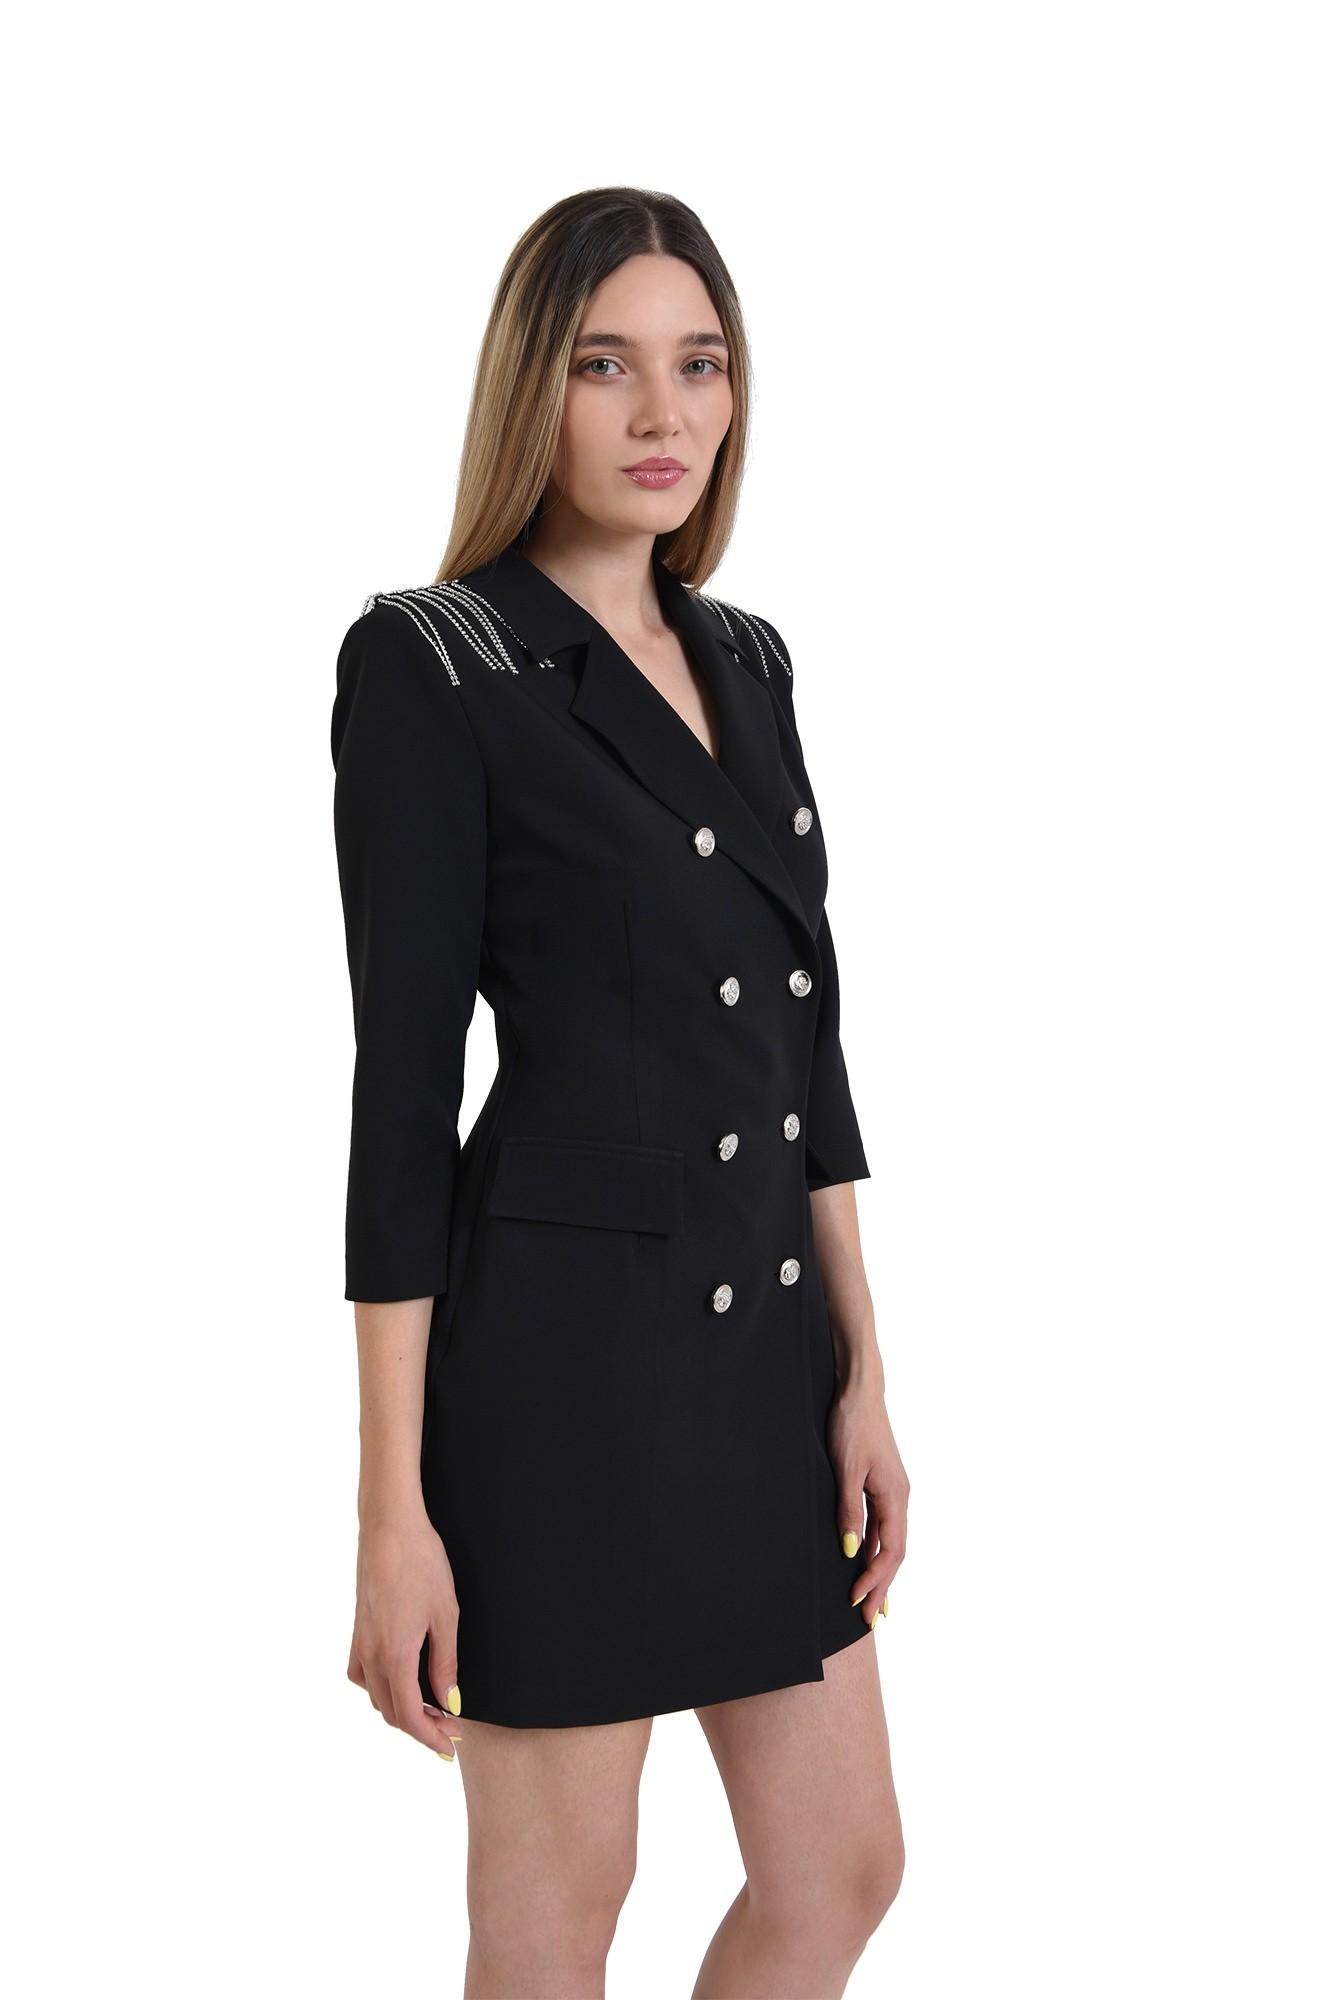 rochie neagra, stil sacou, cu nasturi metalici